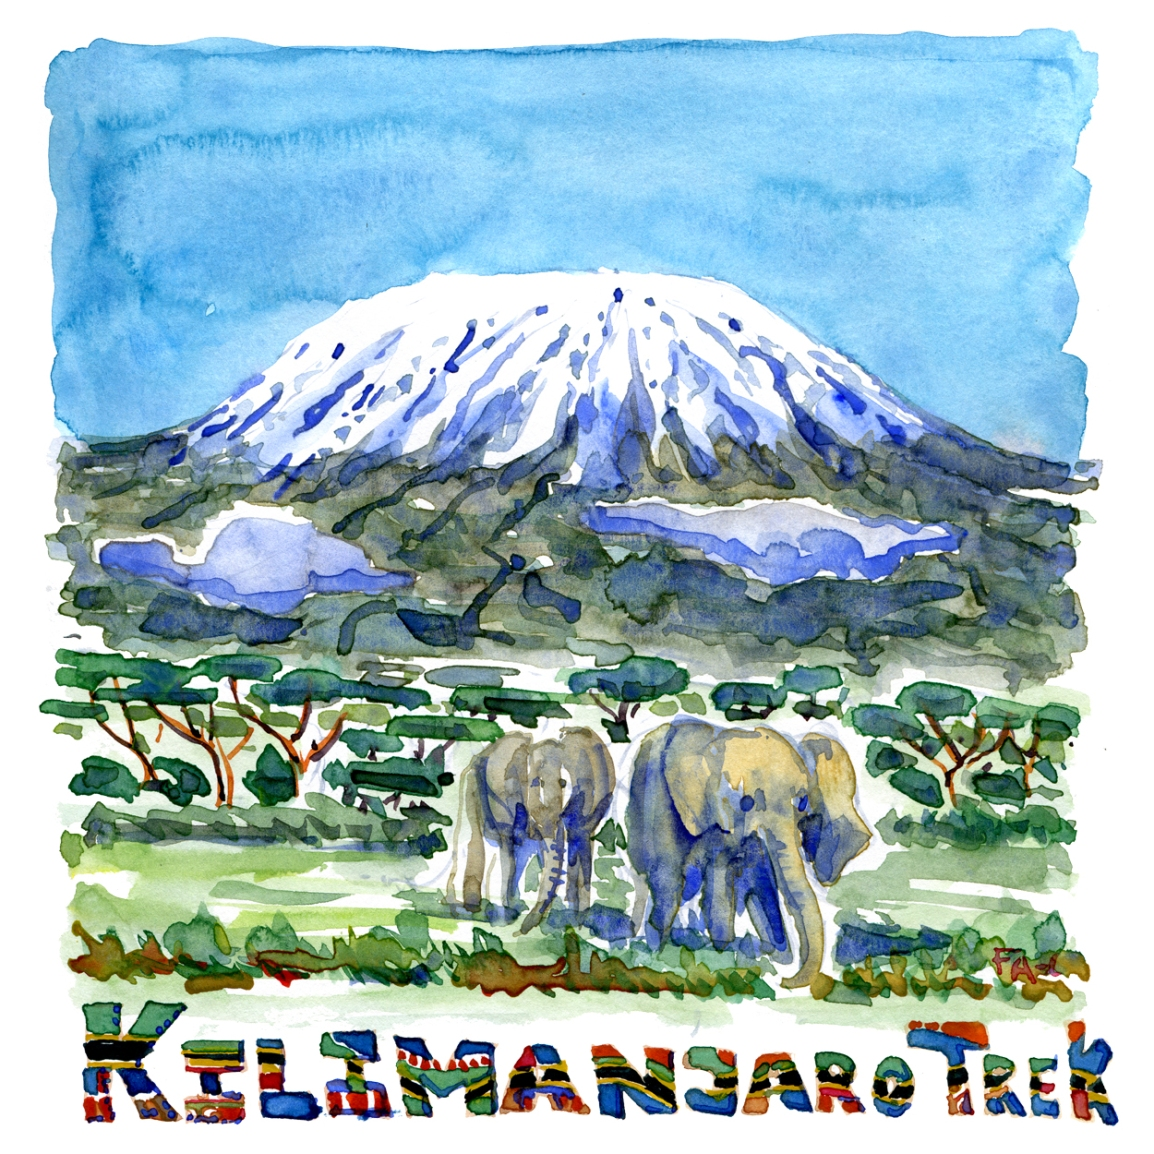 Kilimanjaro Trail